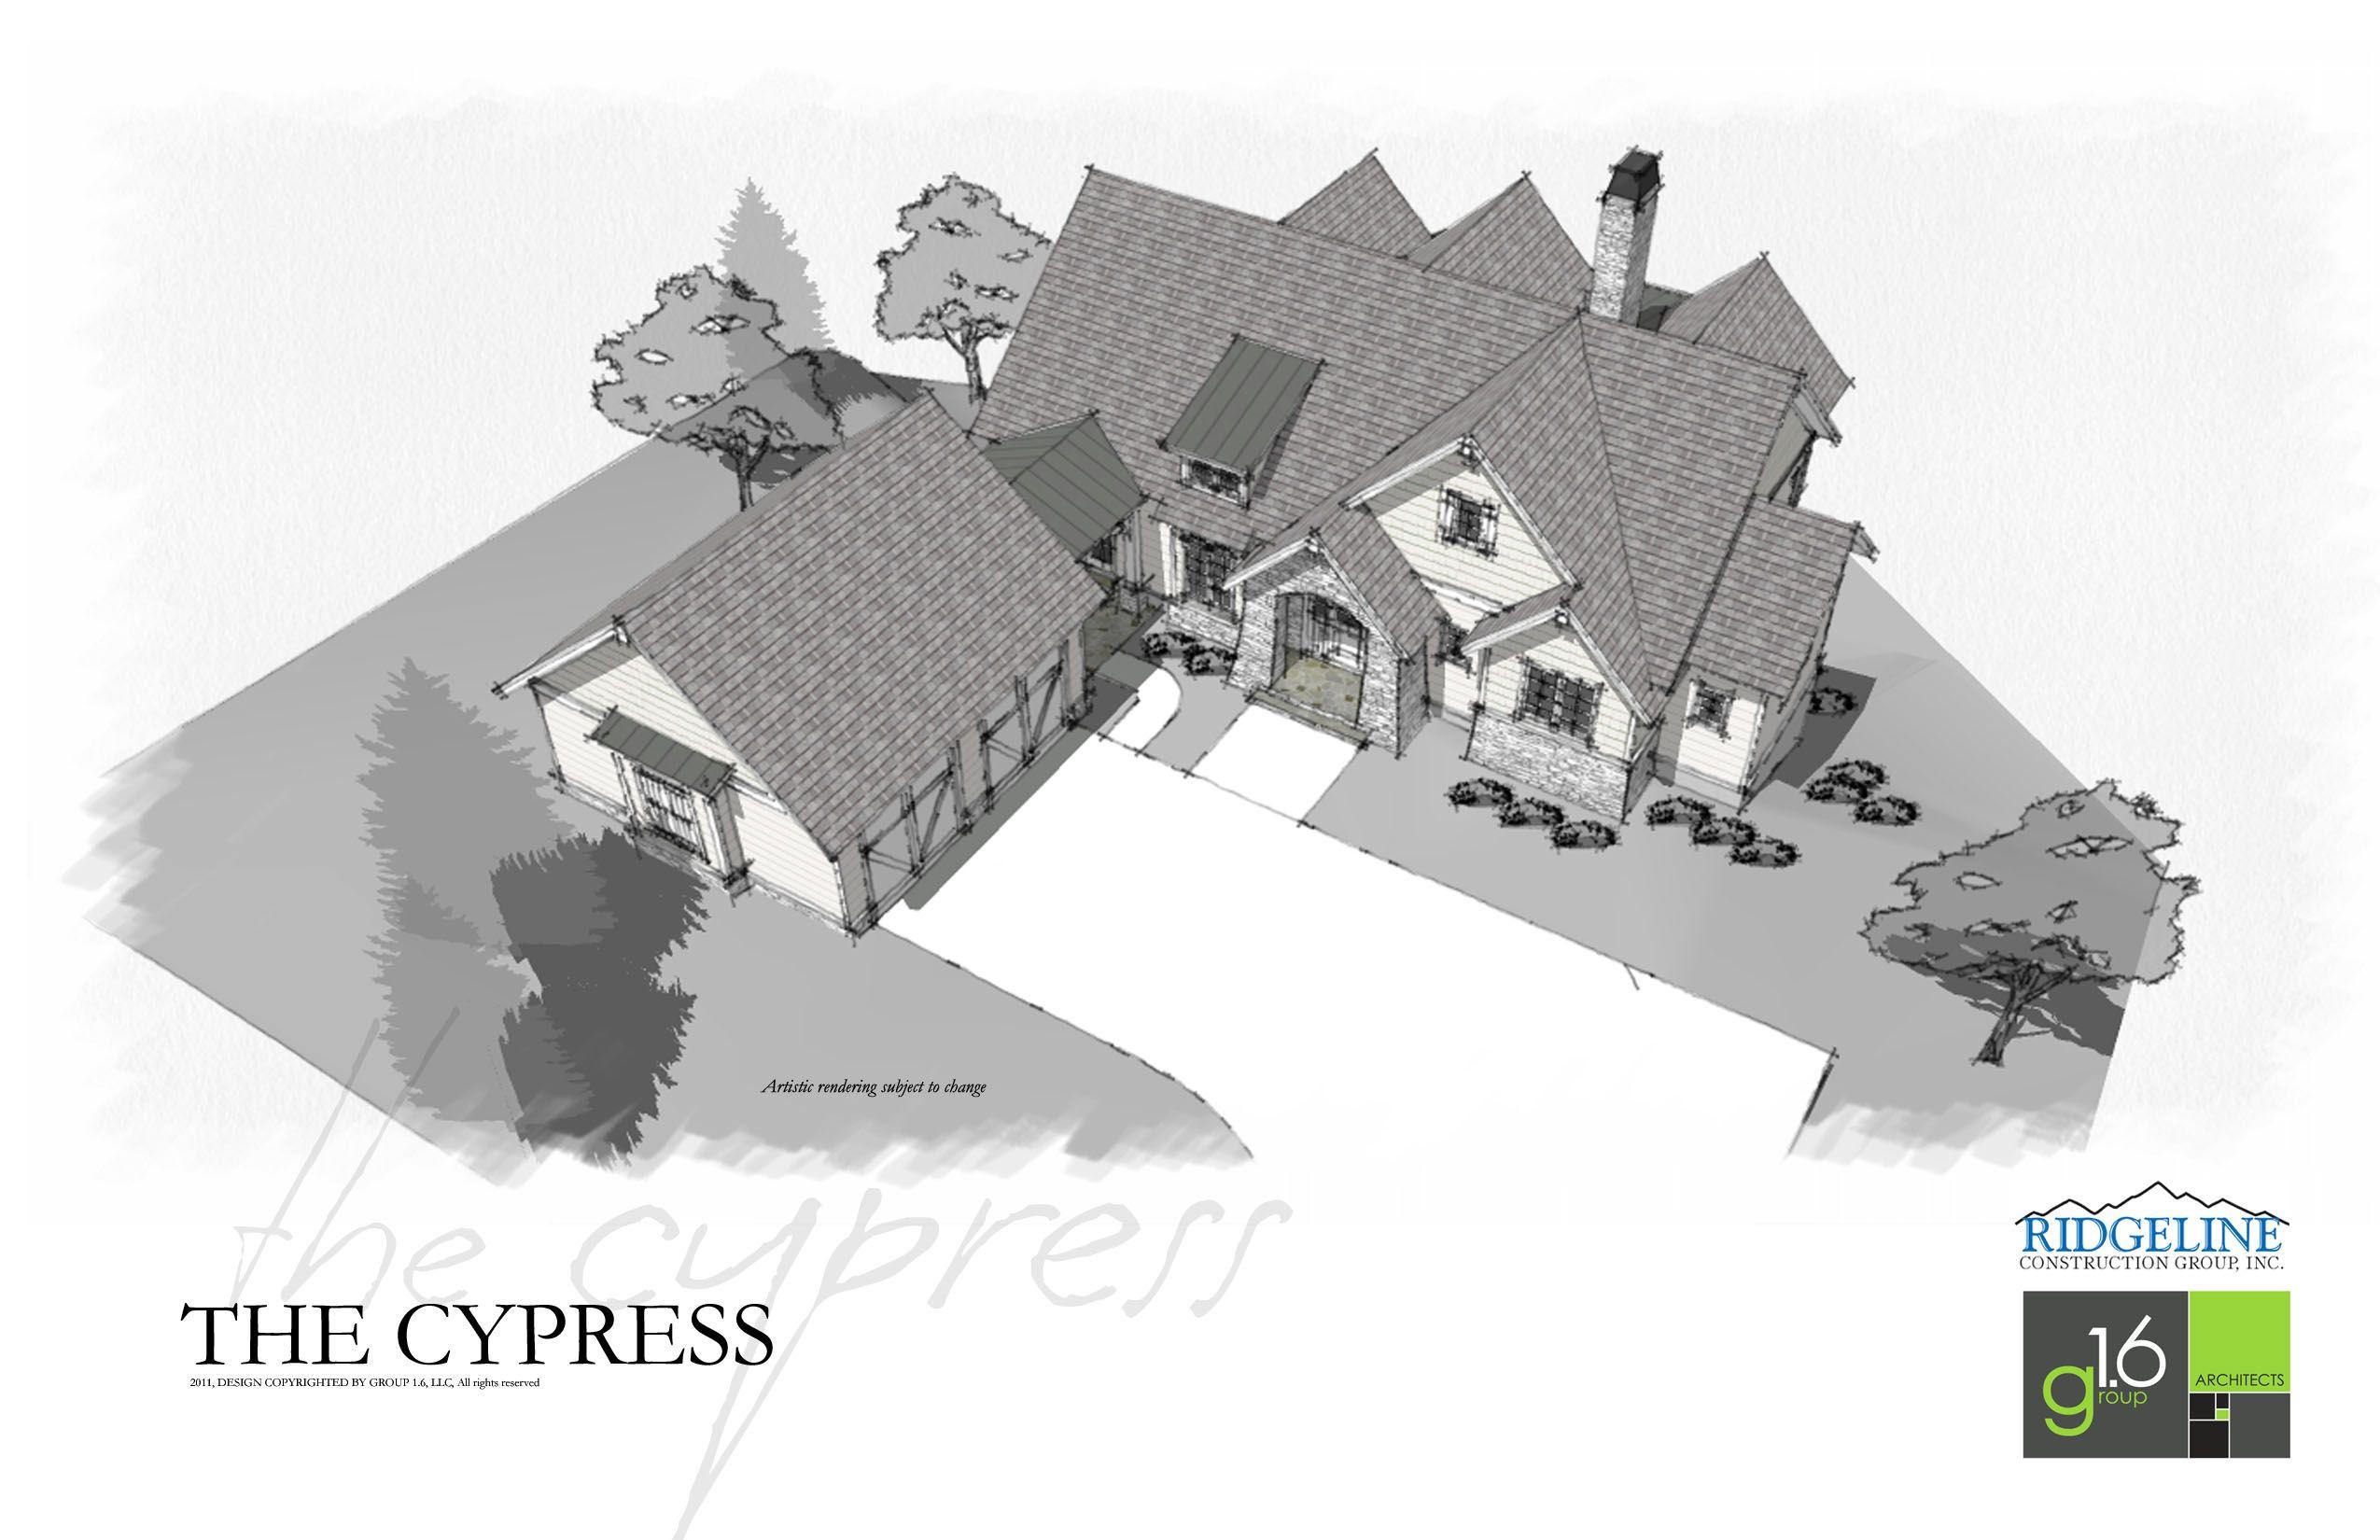 Cypress : Ridgeline Construction Group, Inc.